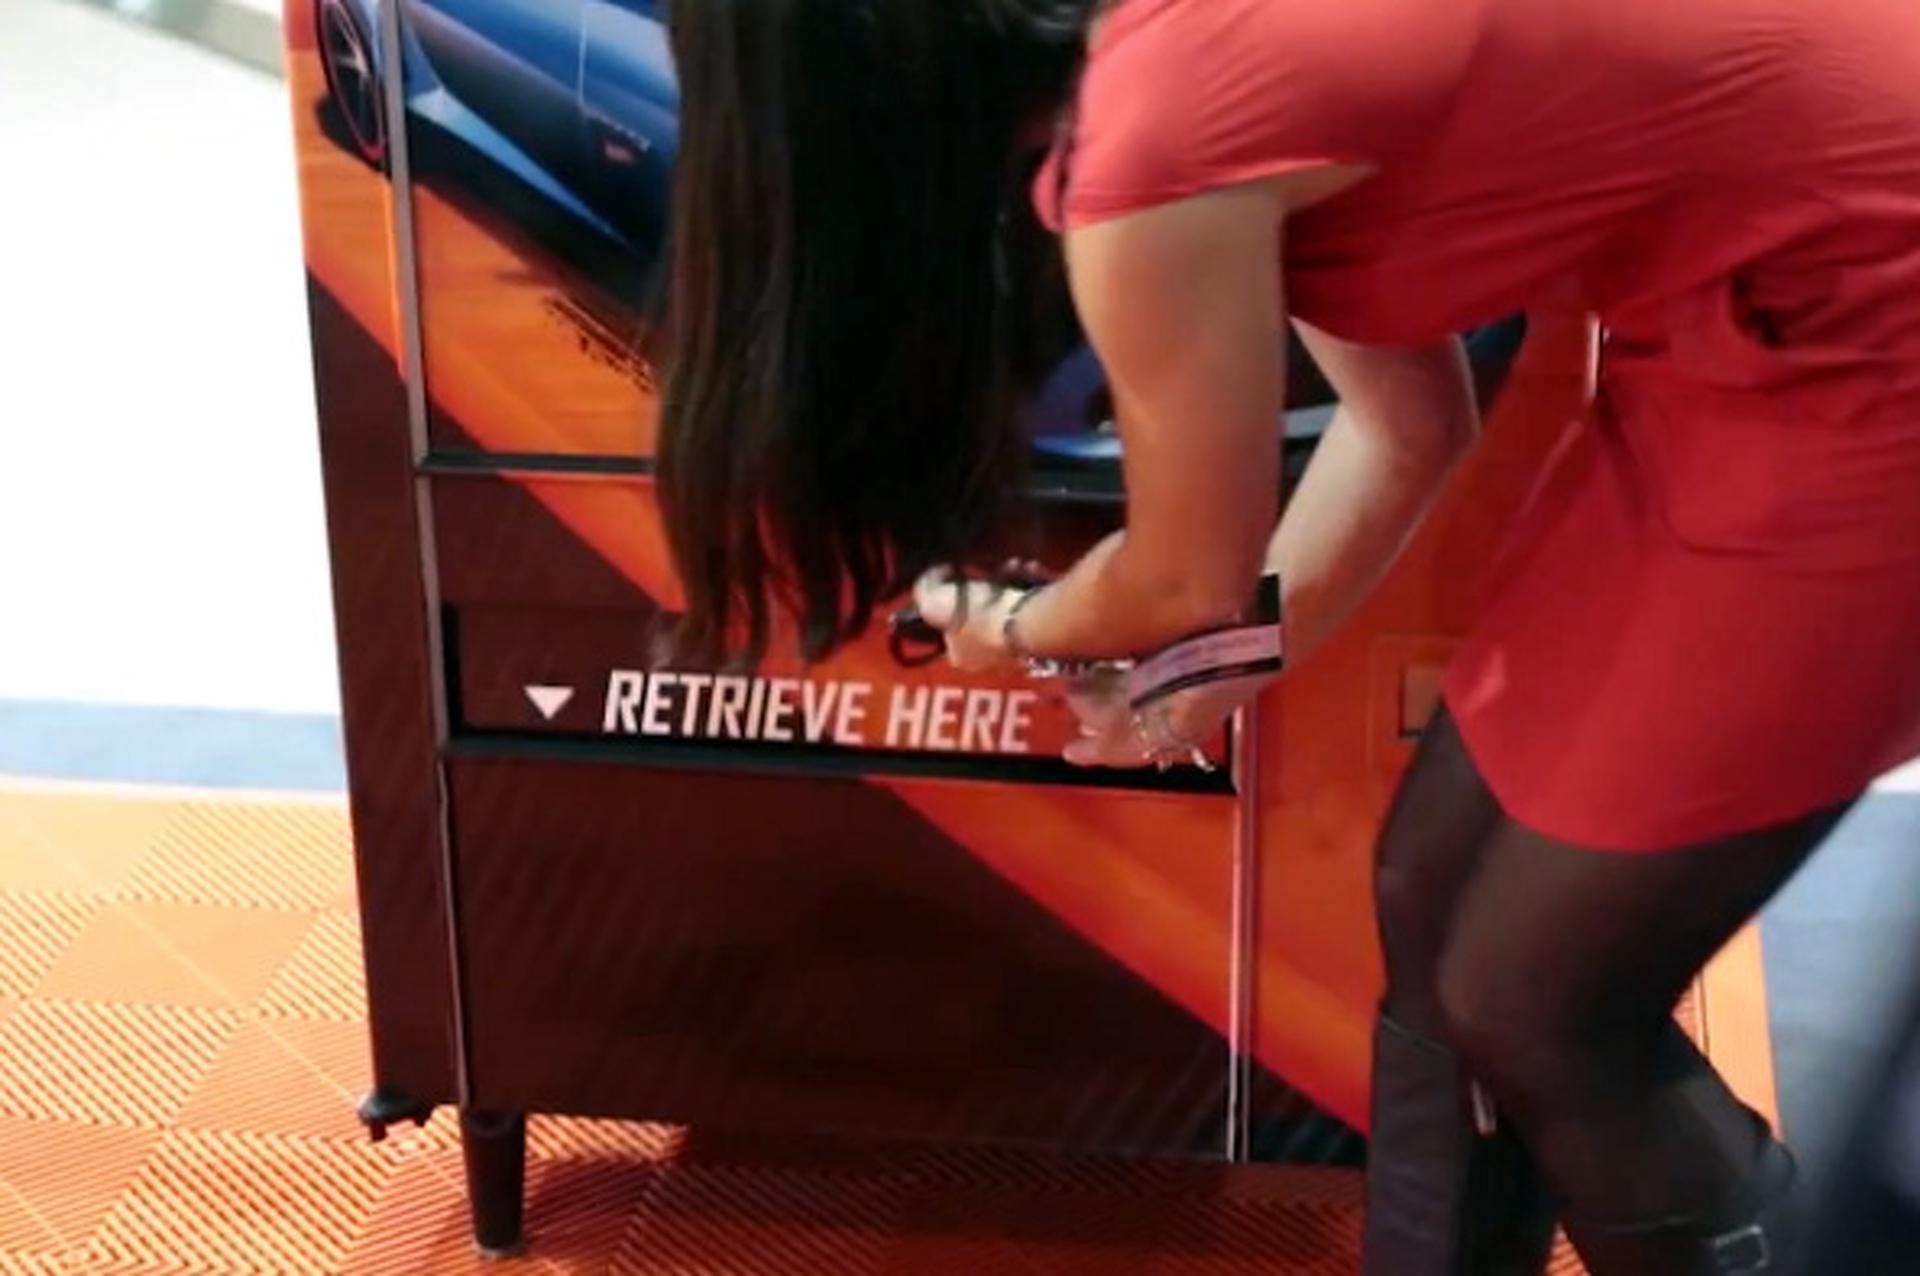 Tweet at This Vending Machine, Receive Hot Wheels Camaro